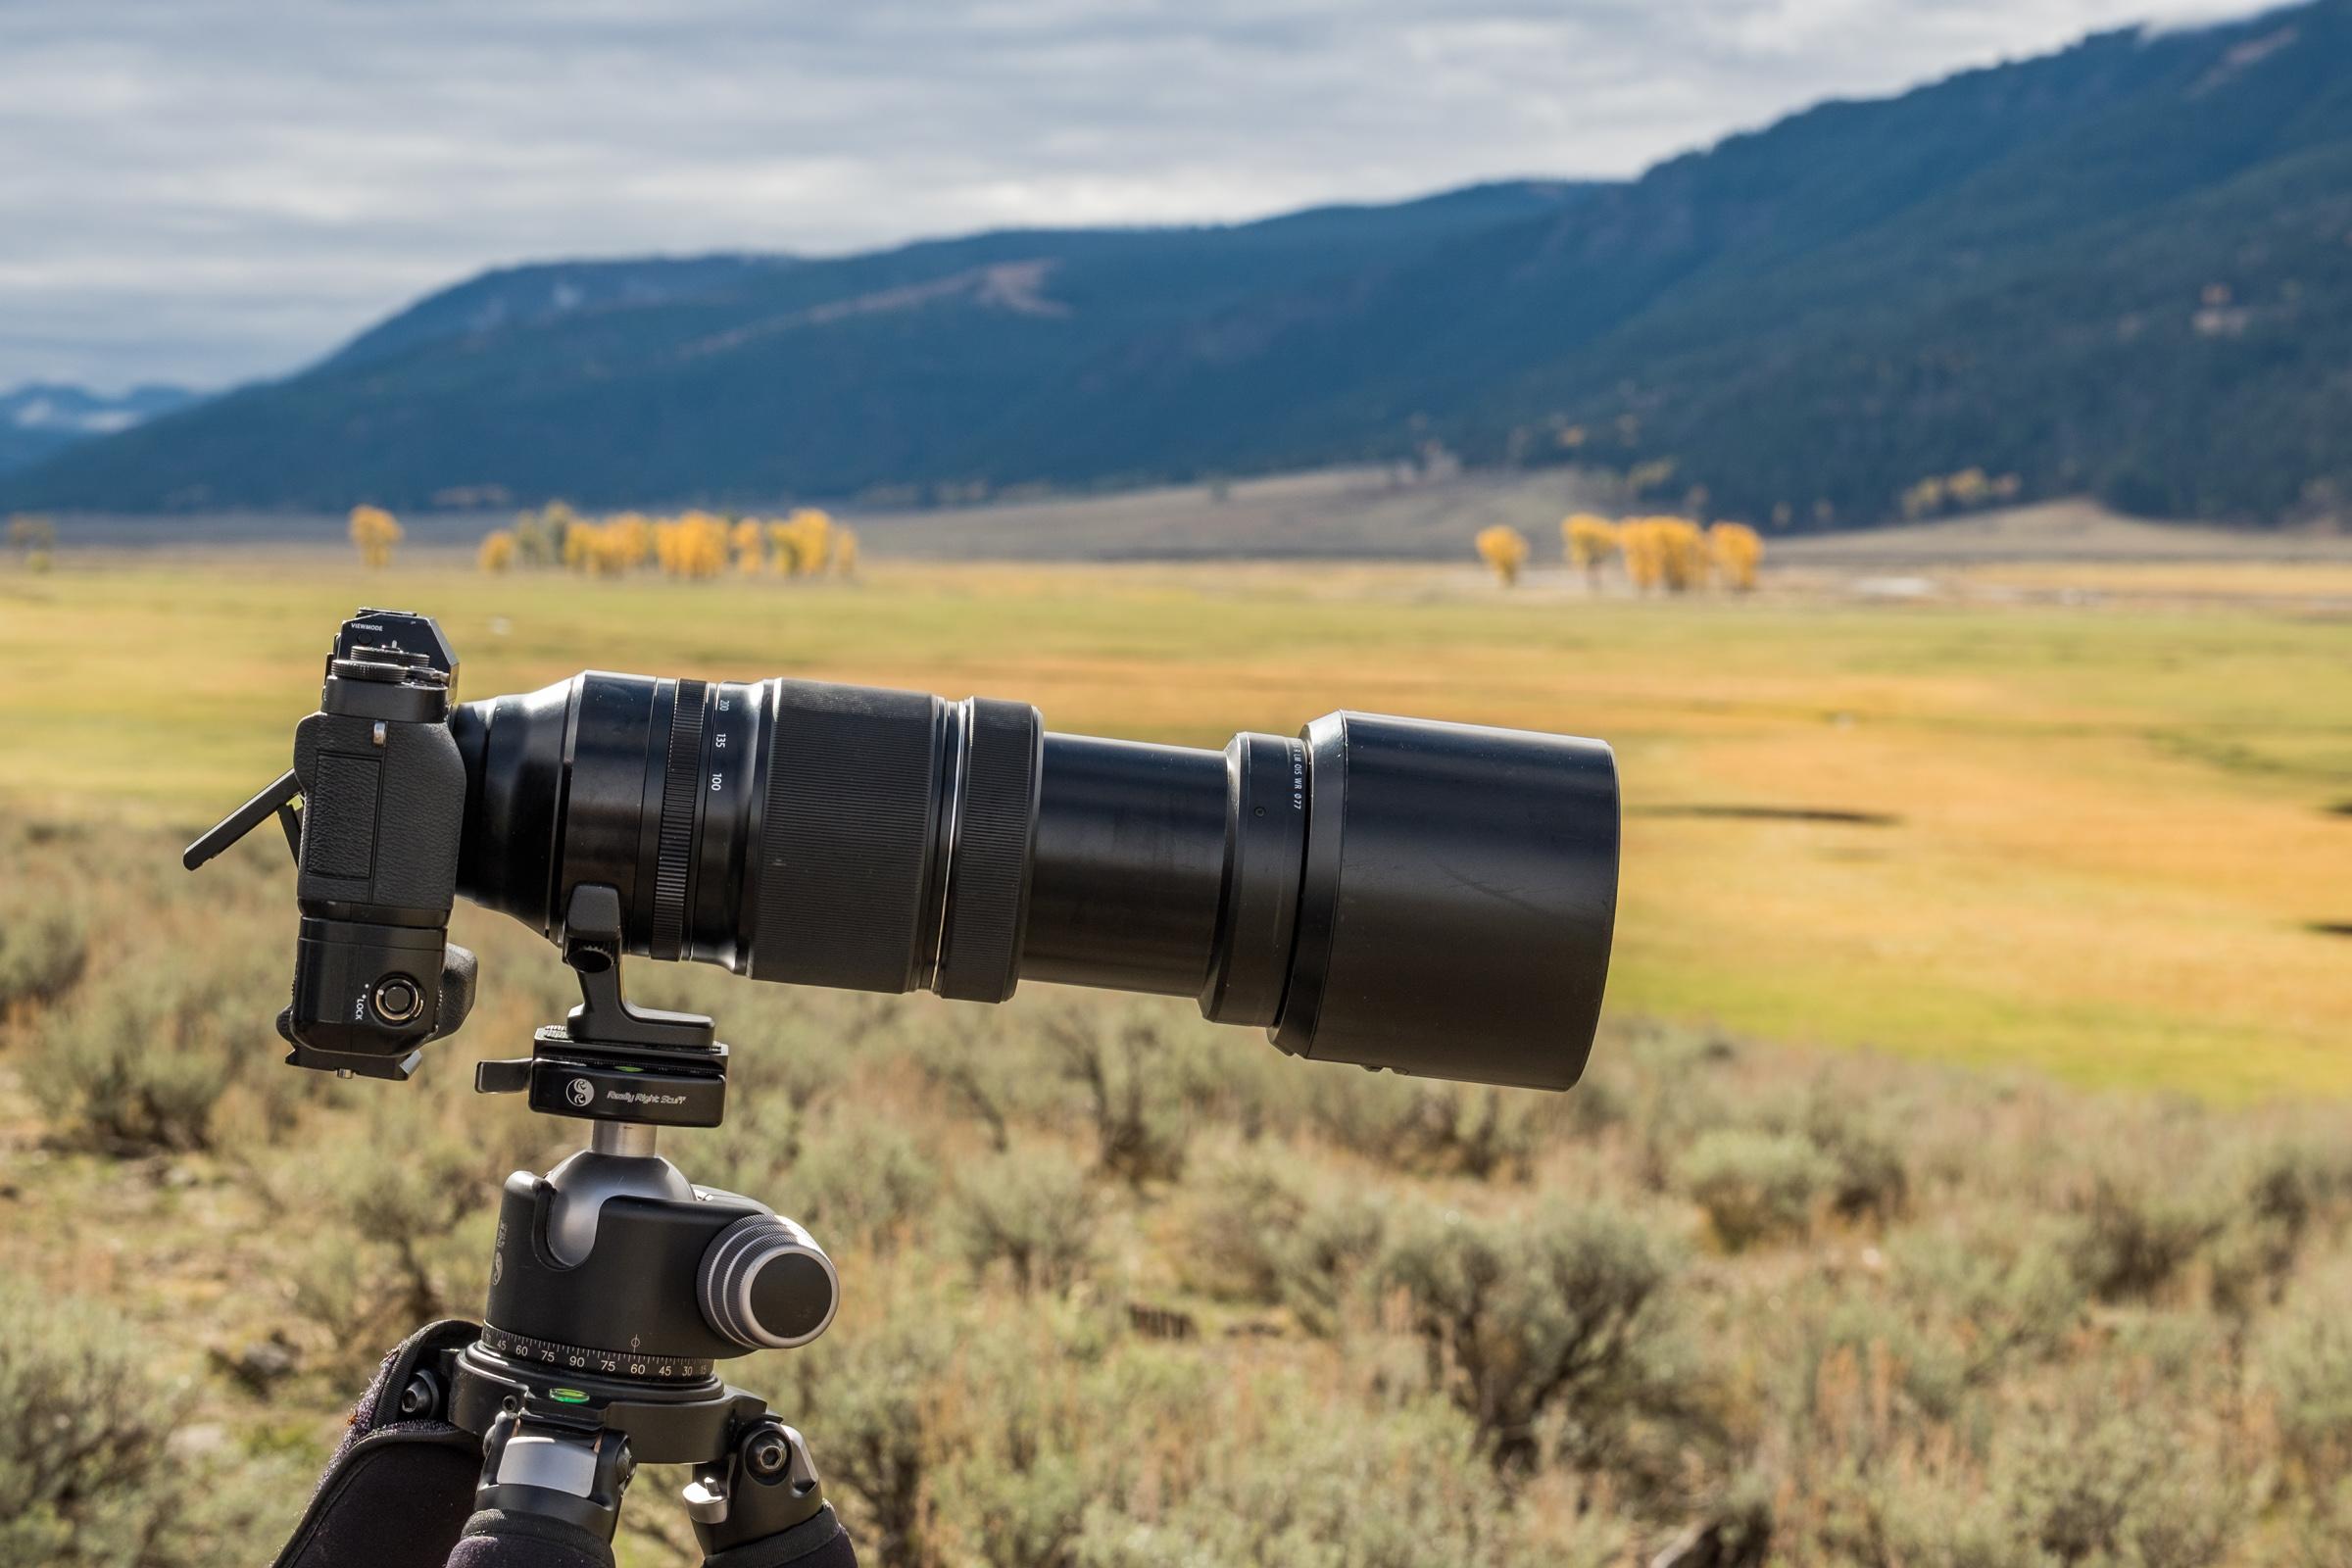 20160922-SP-Yellowstone National Park-_DSF7336.jpg